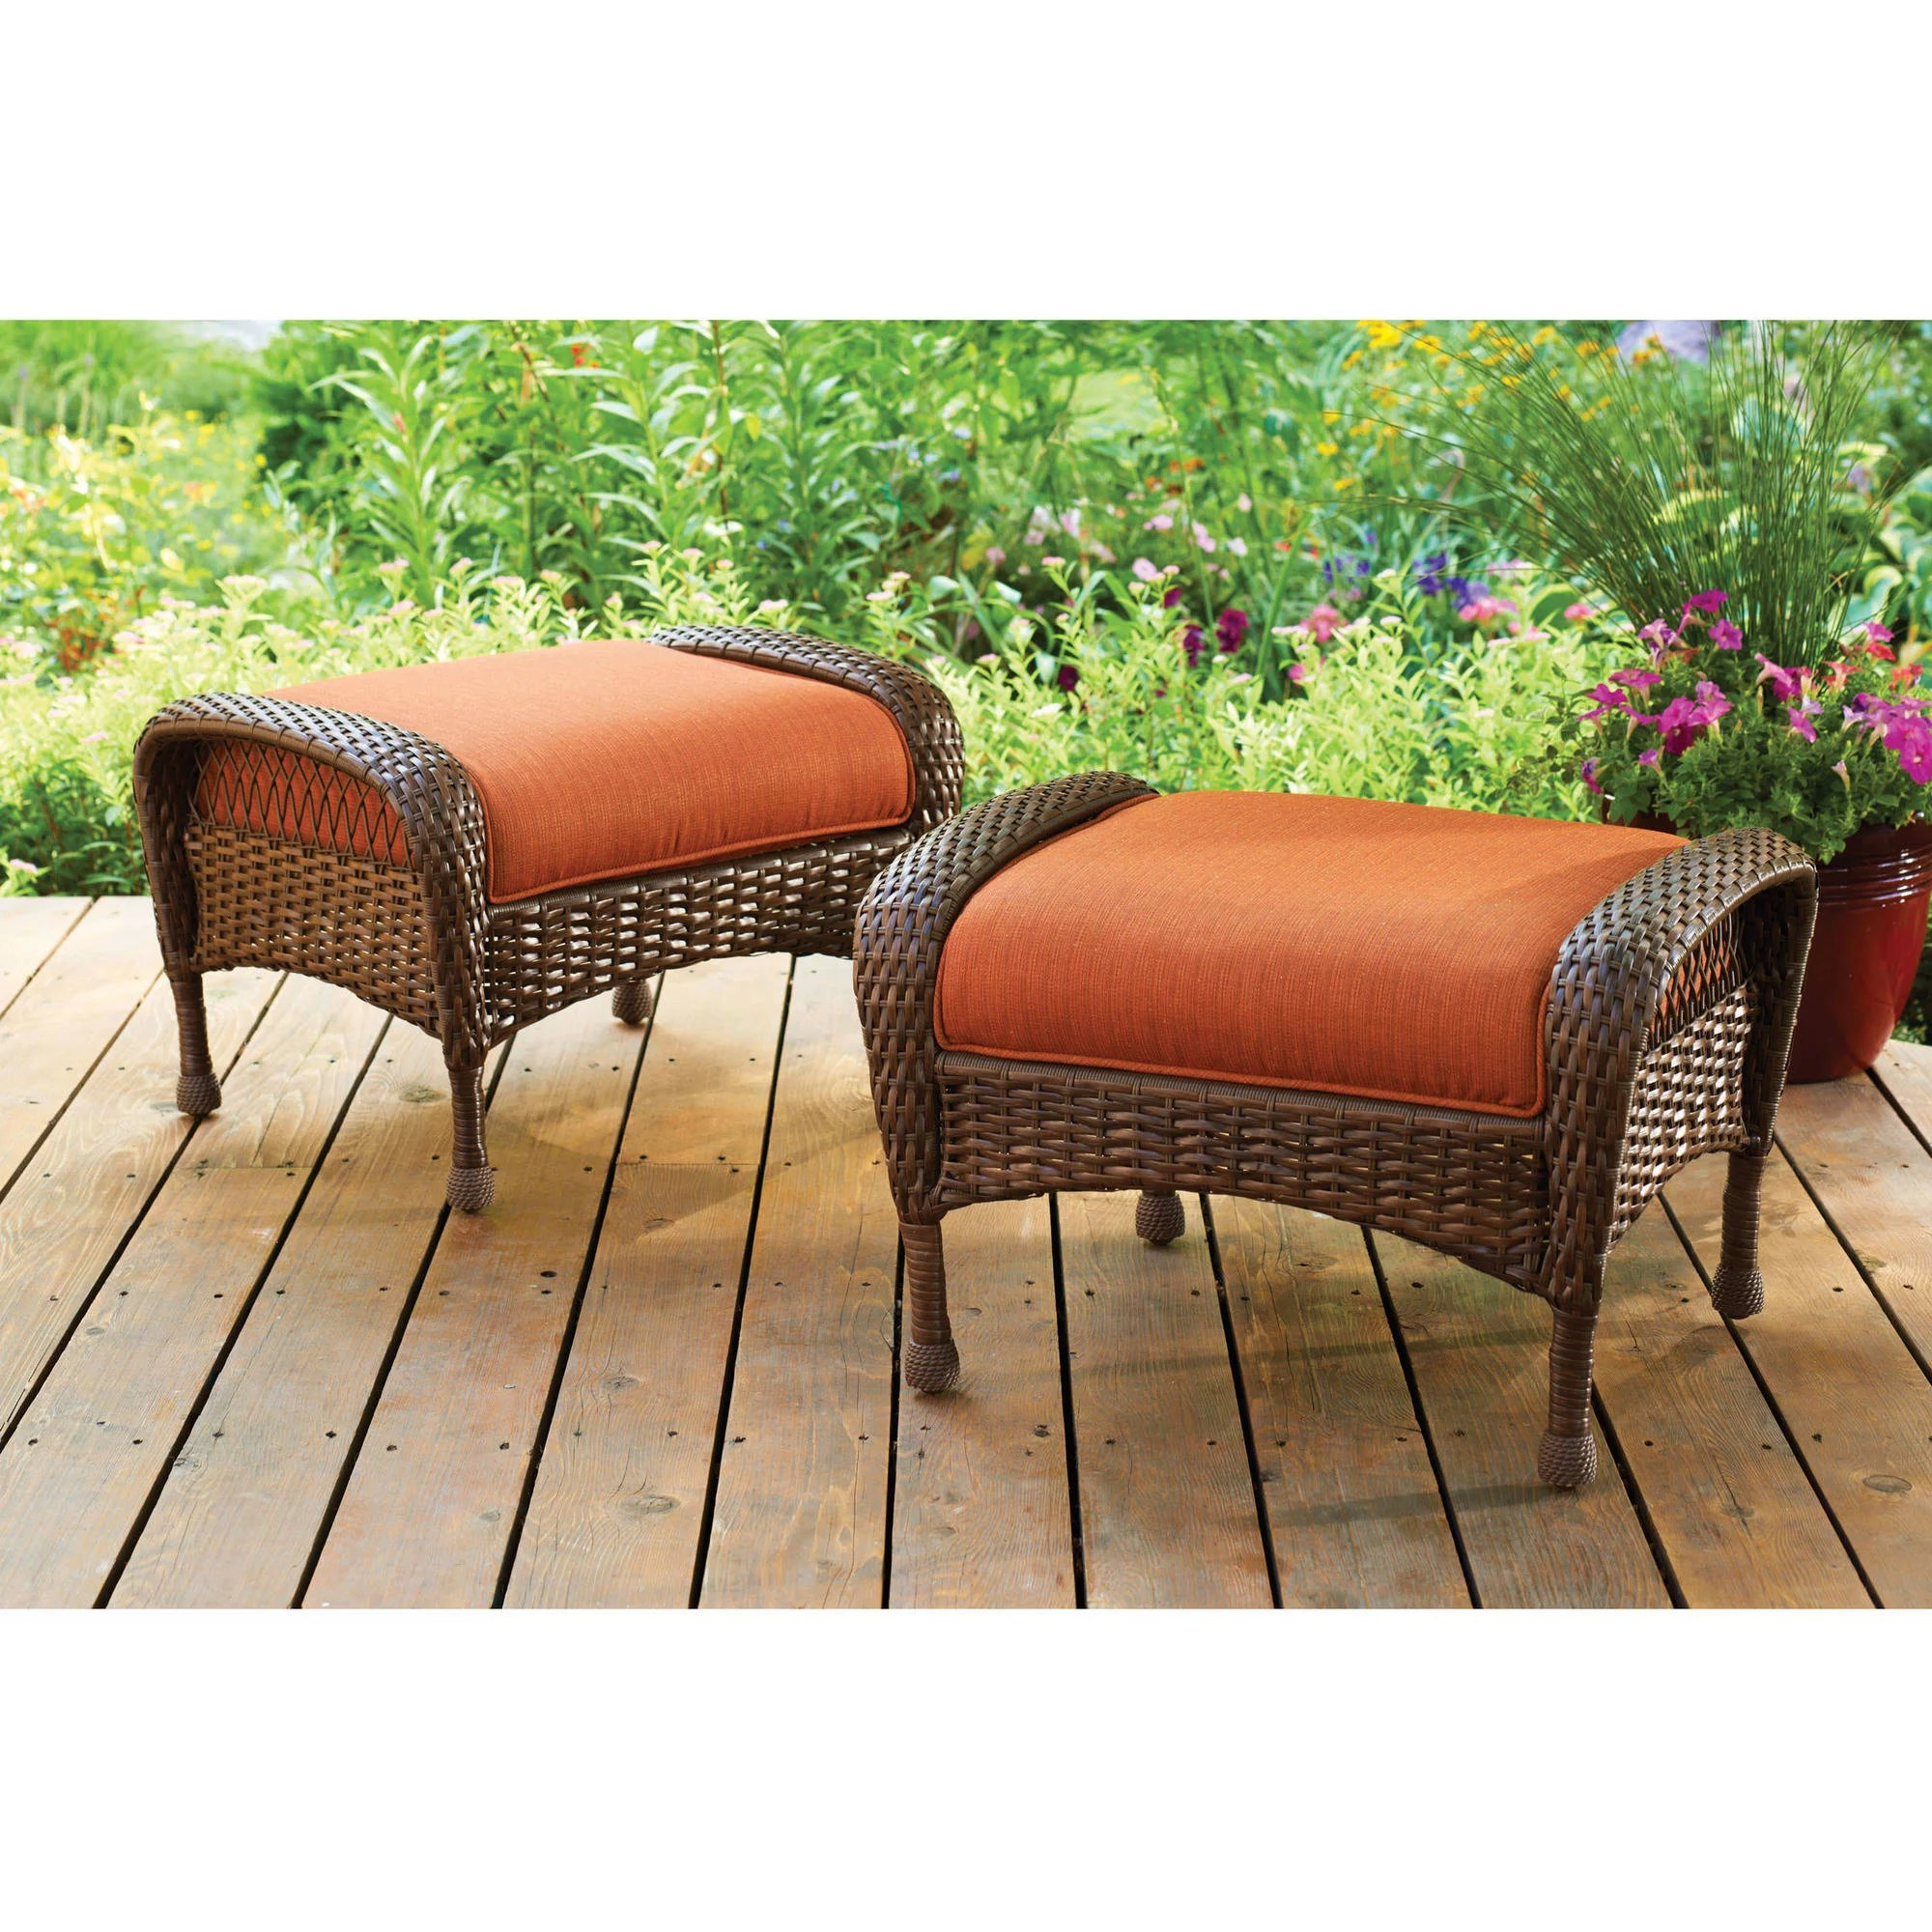 patio chair and ottoman folding sling canada better homes gardens azalea ridge outdoor ottomans set of 2 walmart com